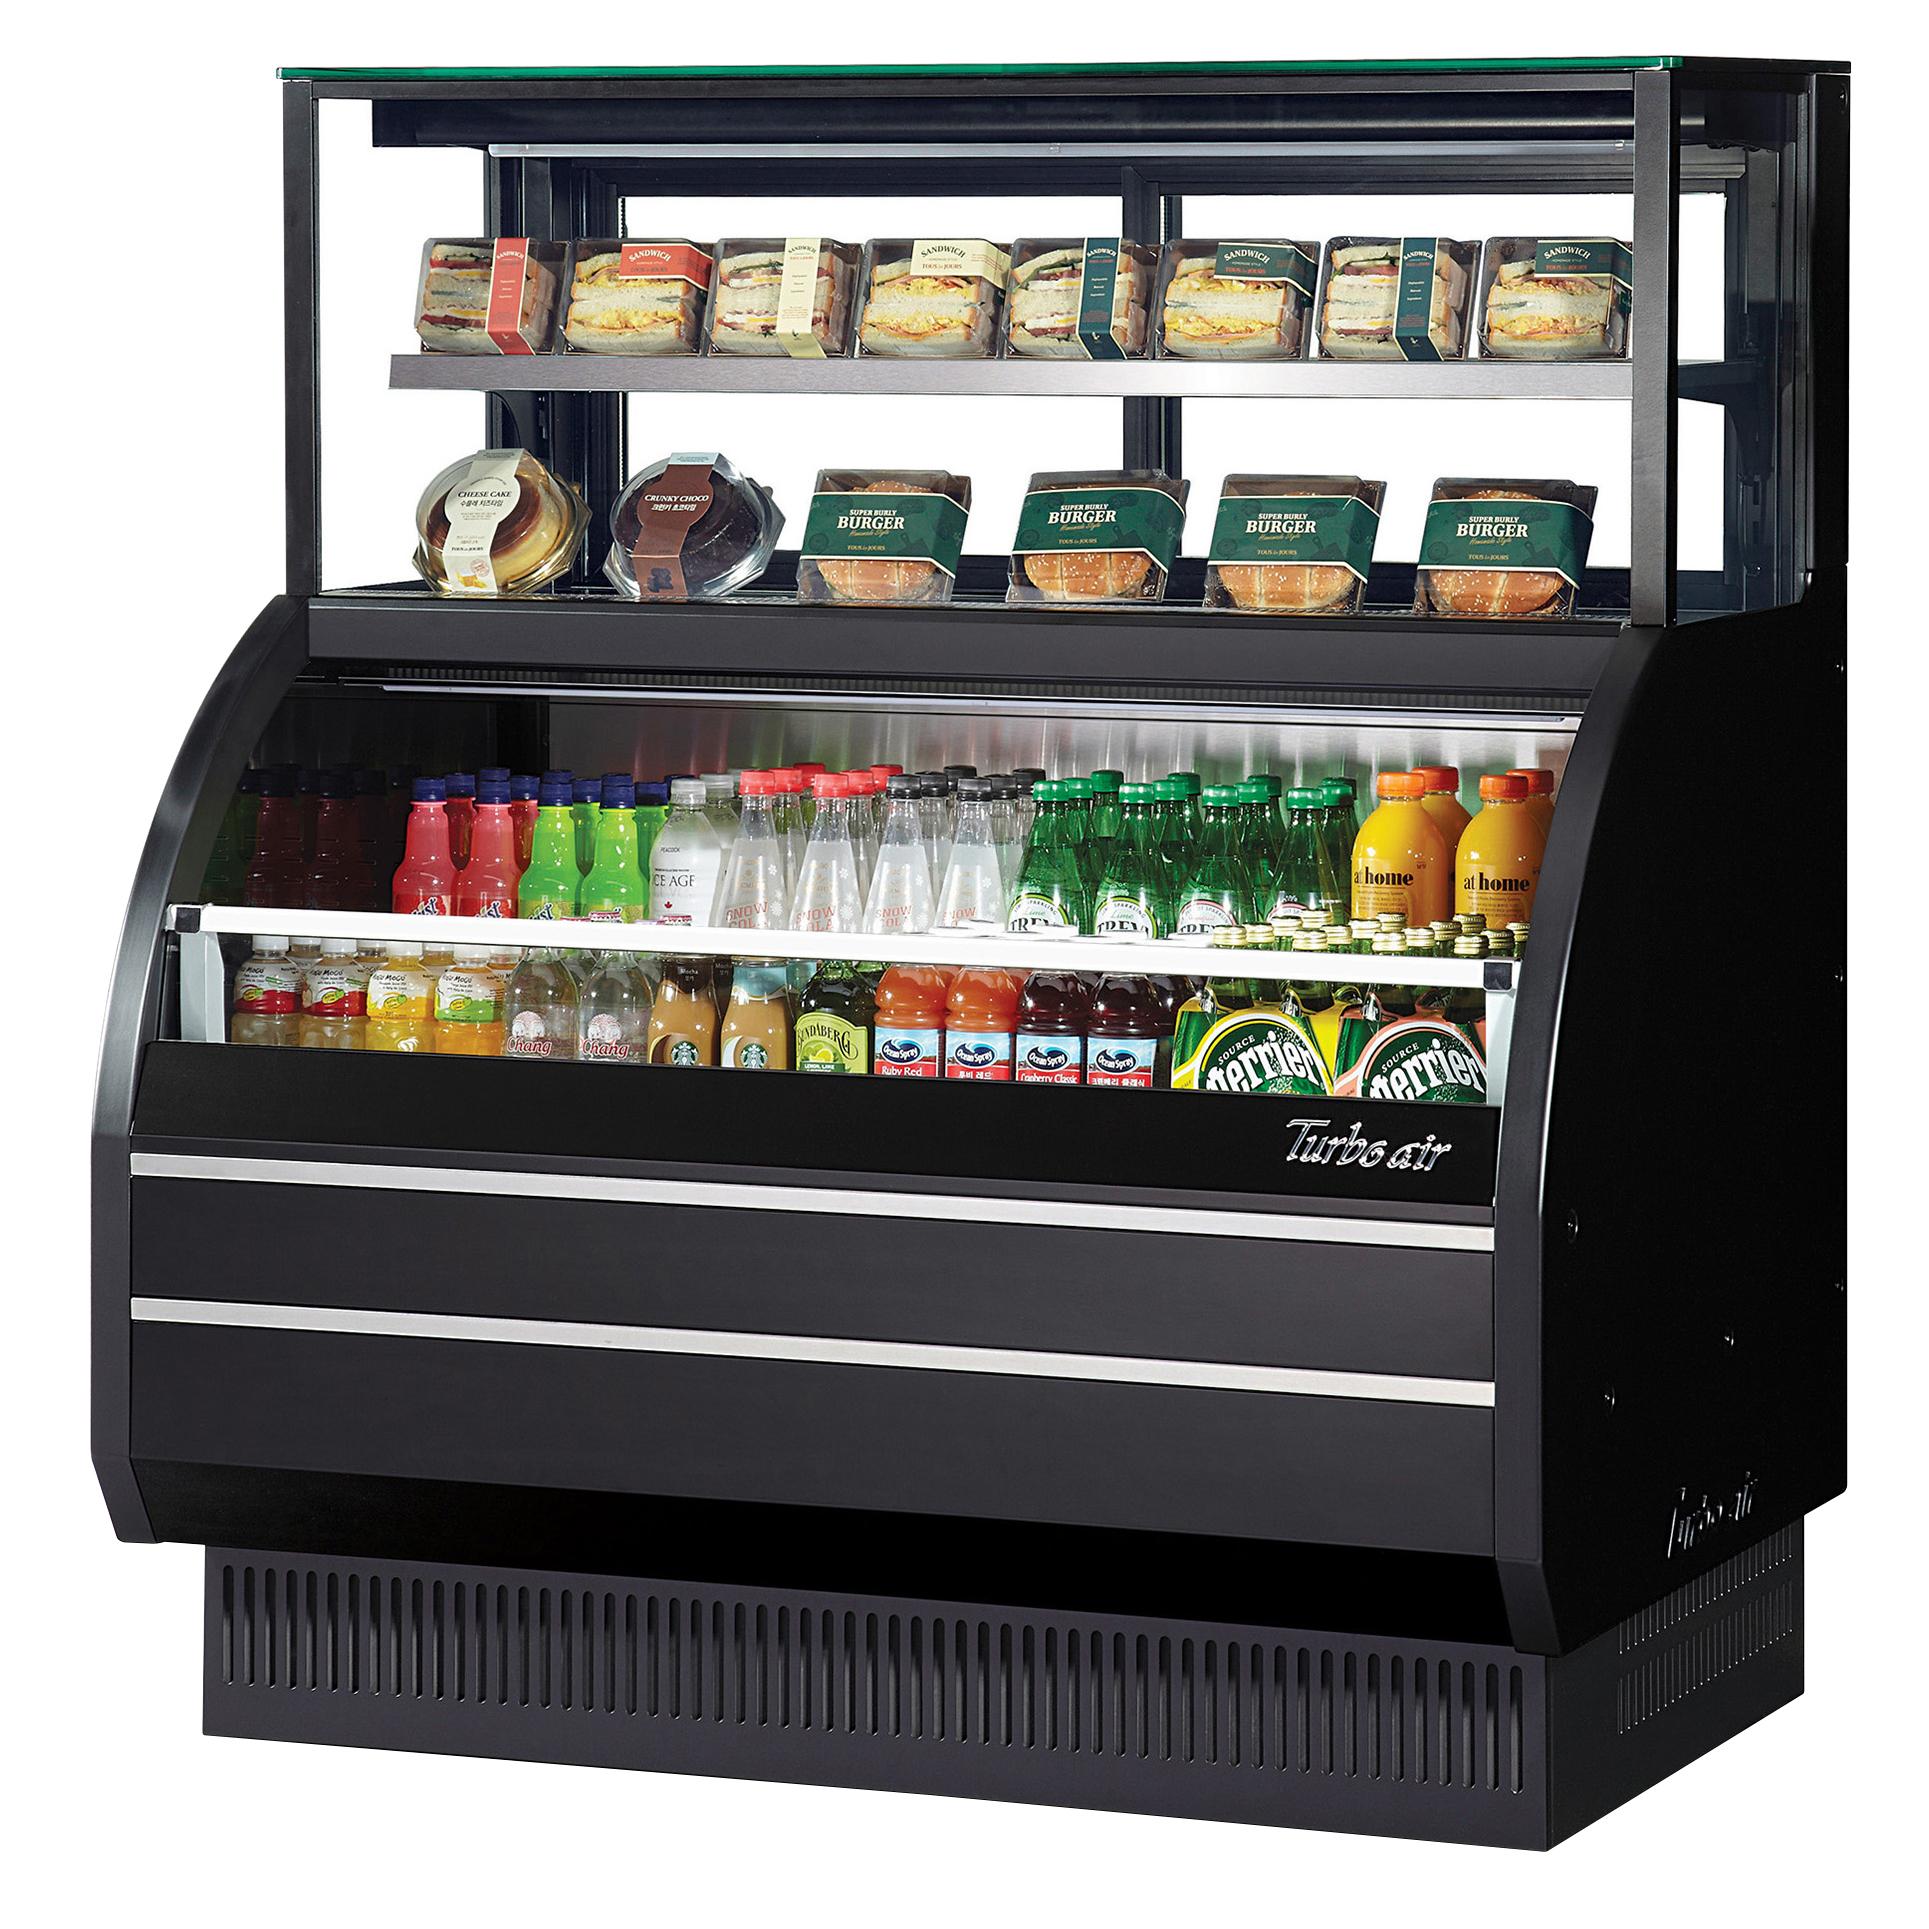 Turbo Air TOM-W-50SB-UF-N merchandiser, open refrigerated display